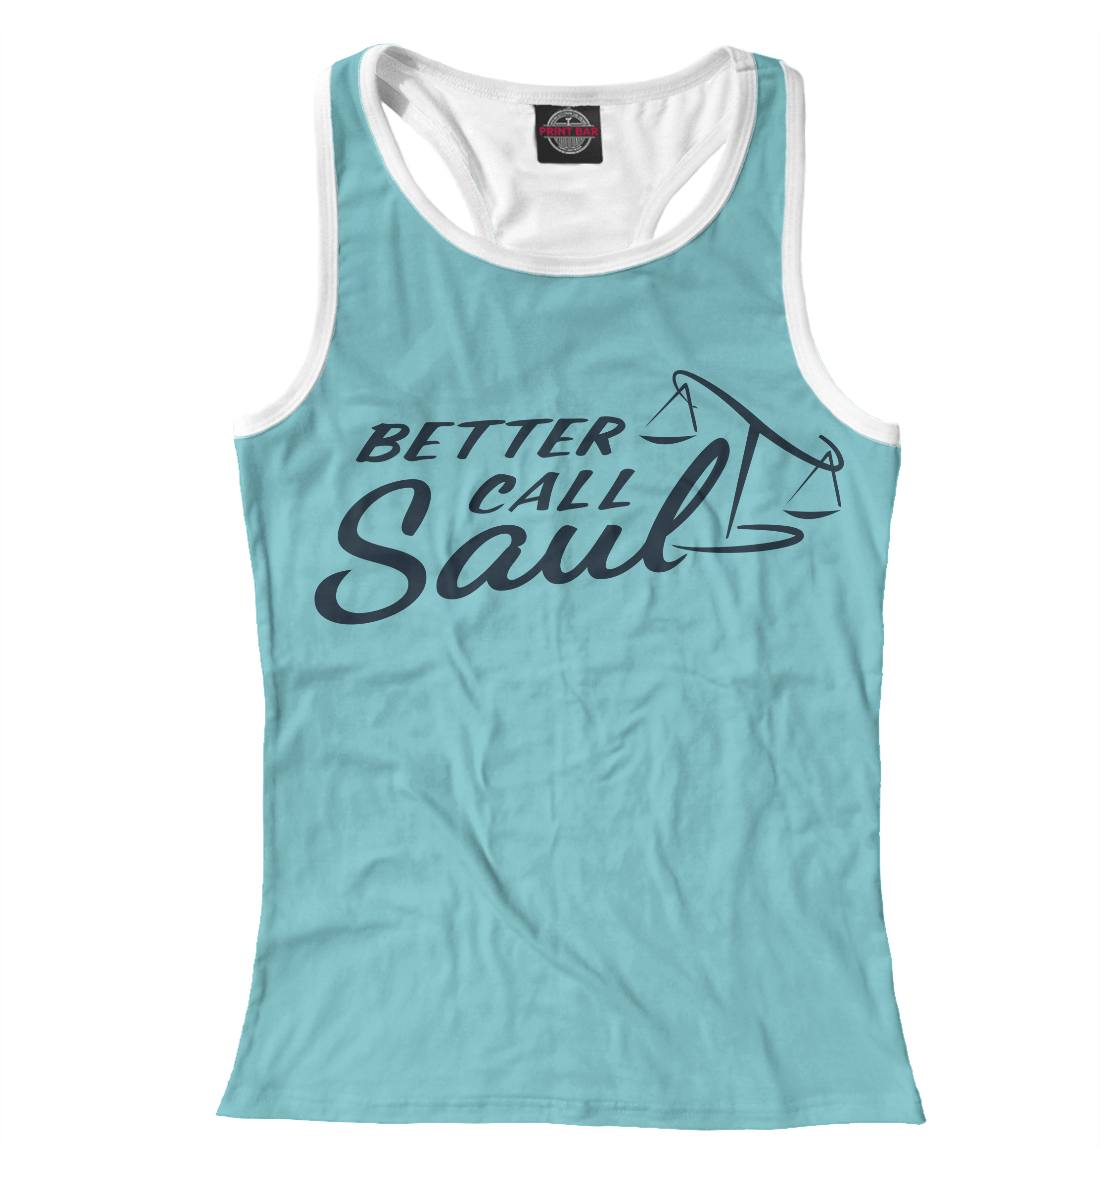 Купить Better Call Saul, Printbar, Майки борцовки, SOT-546972-mayb-1